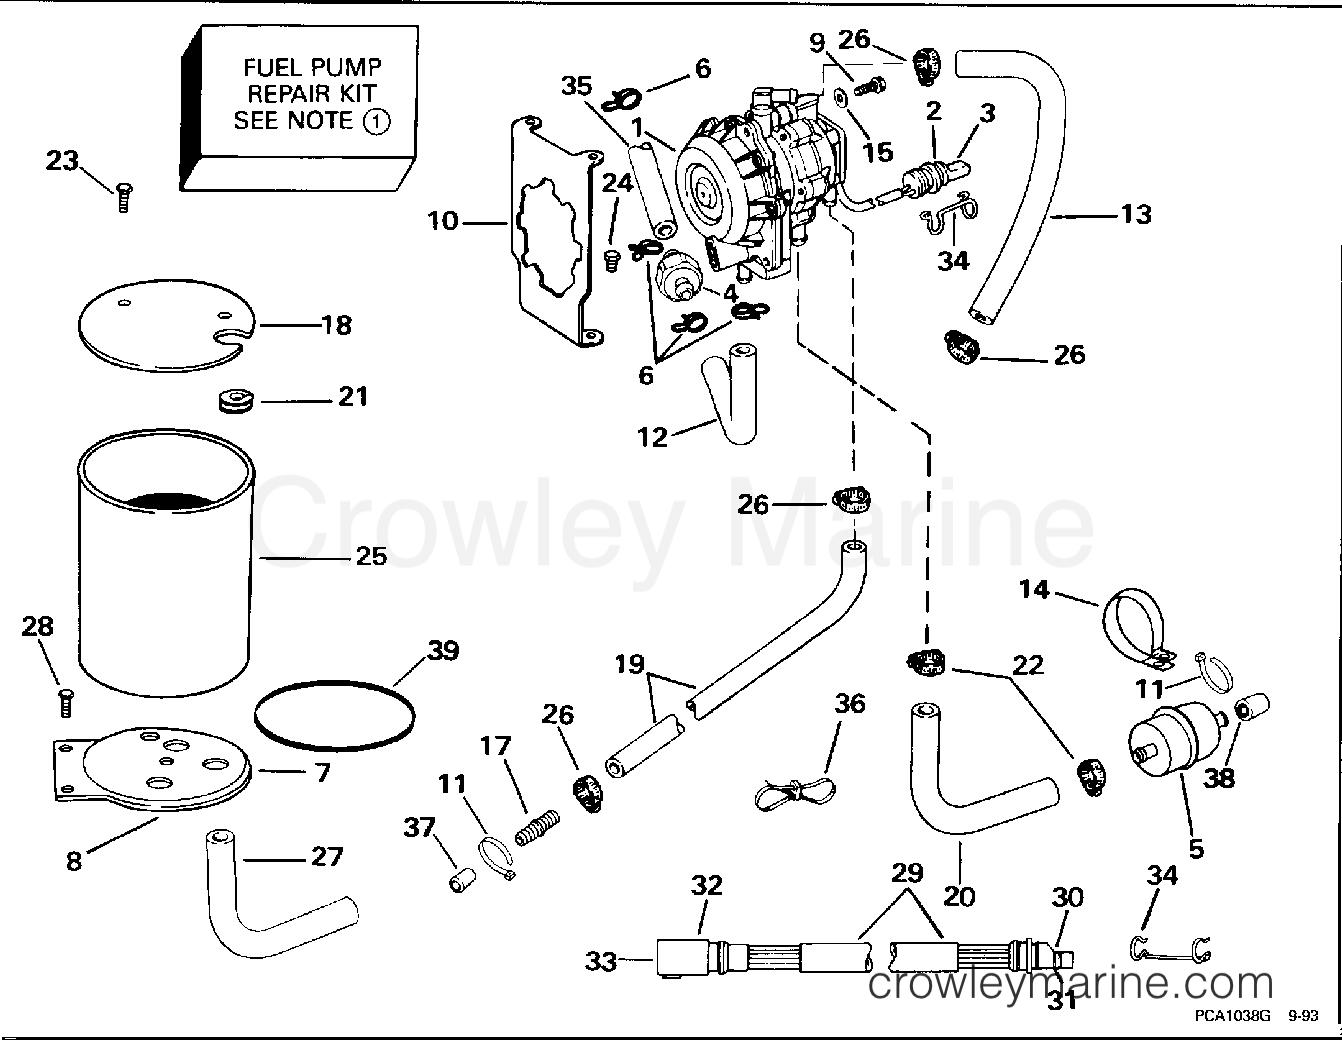 DIAGRAM] Wiring Diagram Omc 115 Turbojet FULL Version HD Quality 115  Turbojet - SOCIALMEDIADIAGRAMS.K-DANSE.FRK-danse.fr